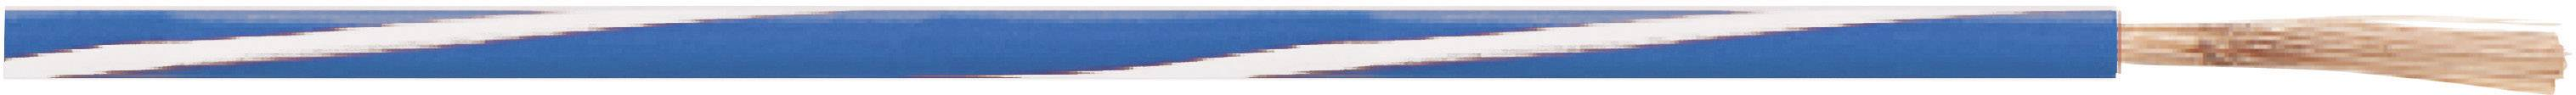 Opletenie / lanko LappKabel 4512451S X05V-K, 1 x 0.50 mm², vonkajší Ø 2.10 mm, metrový tovar, biela, hnedá